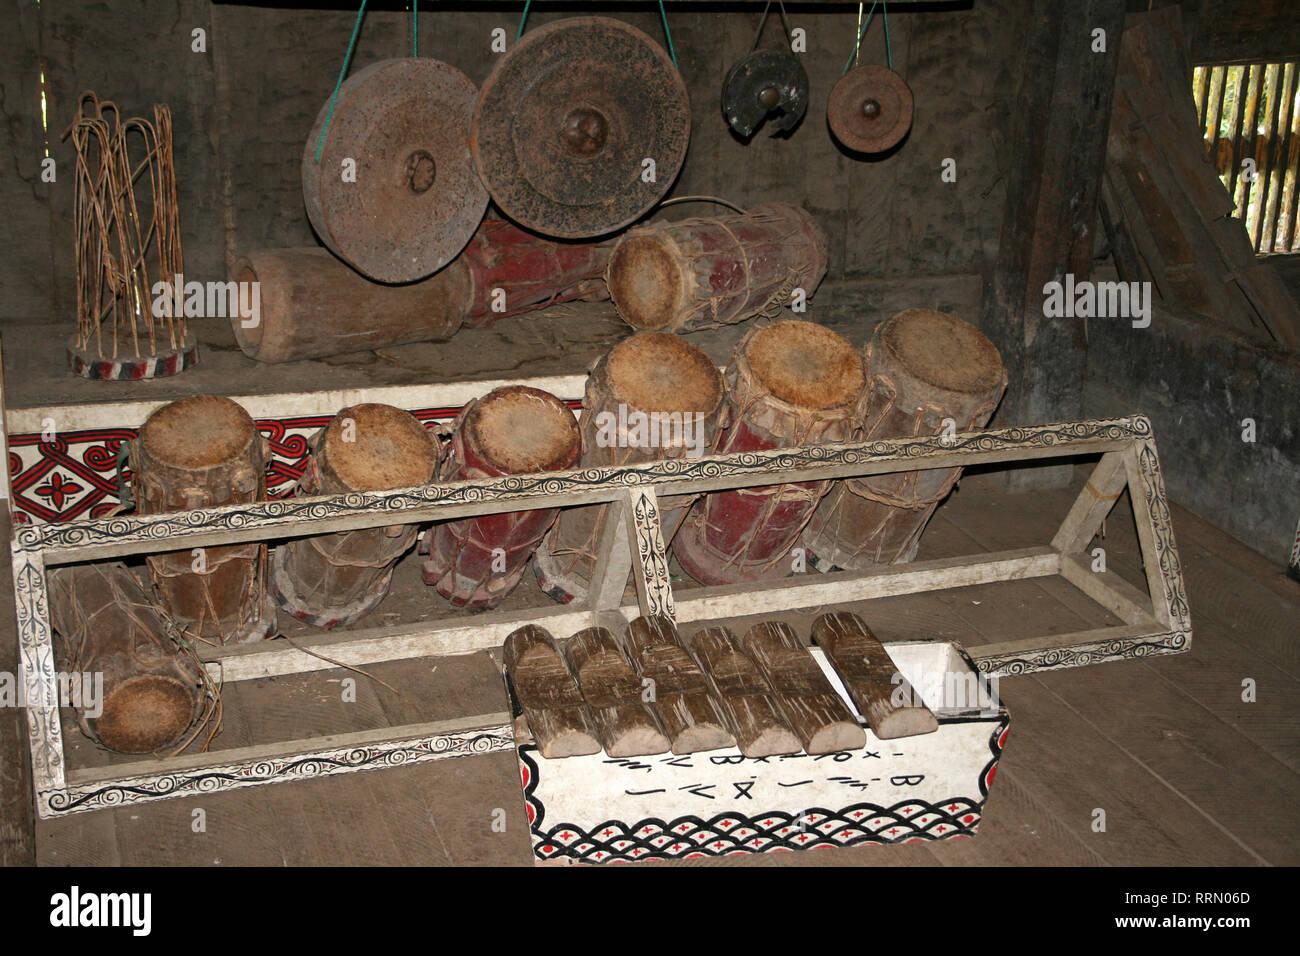 Strumenti musicali tra cui gambang (xilofono), tamburi e gong, nel palazzo del re Simalungun a Pematang Purba, Sumatra Immagini Stock